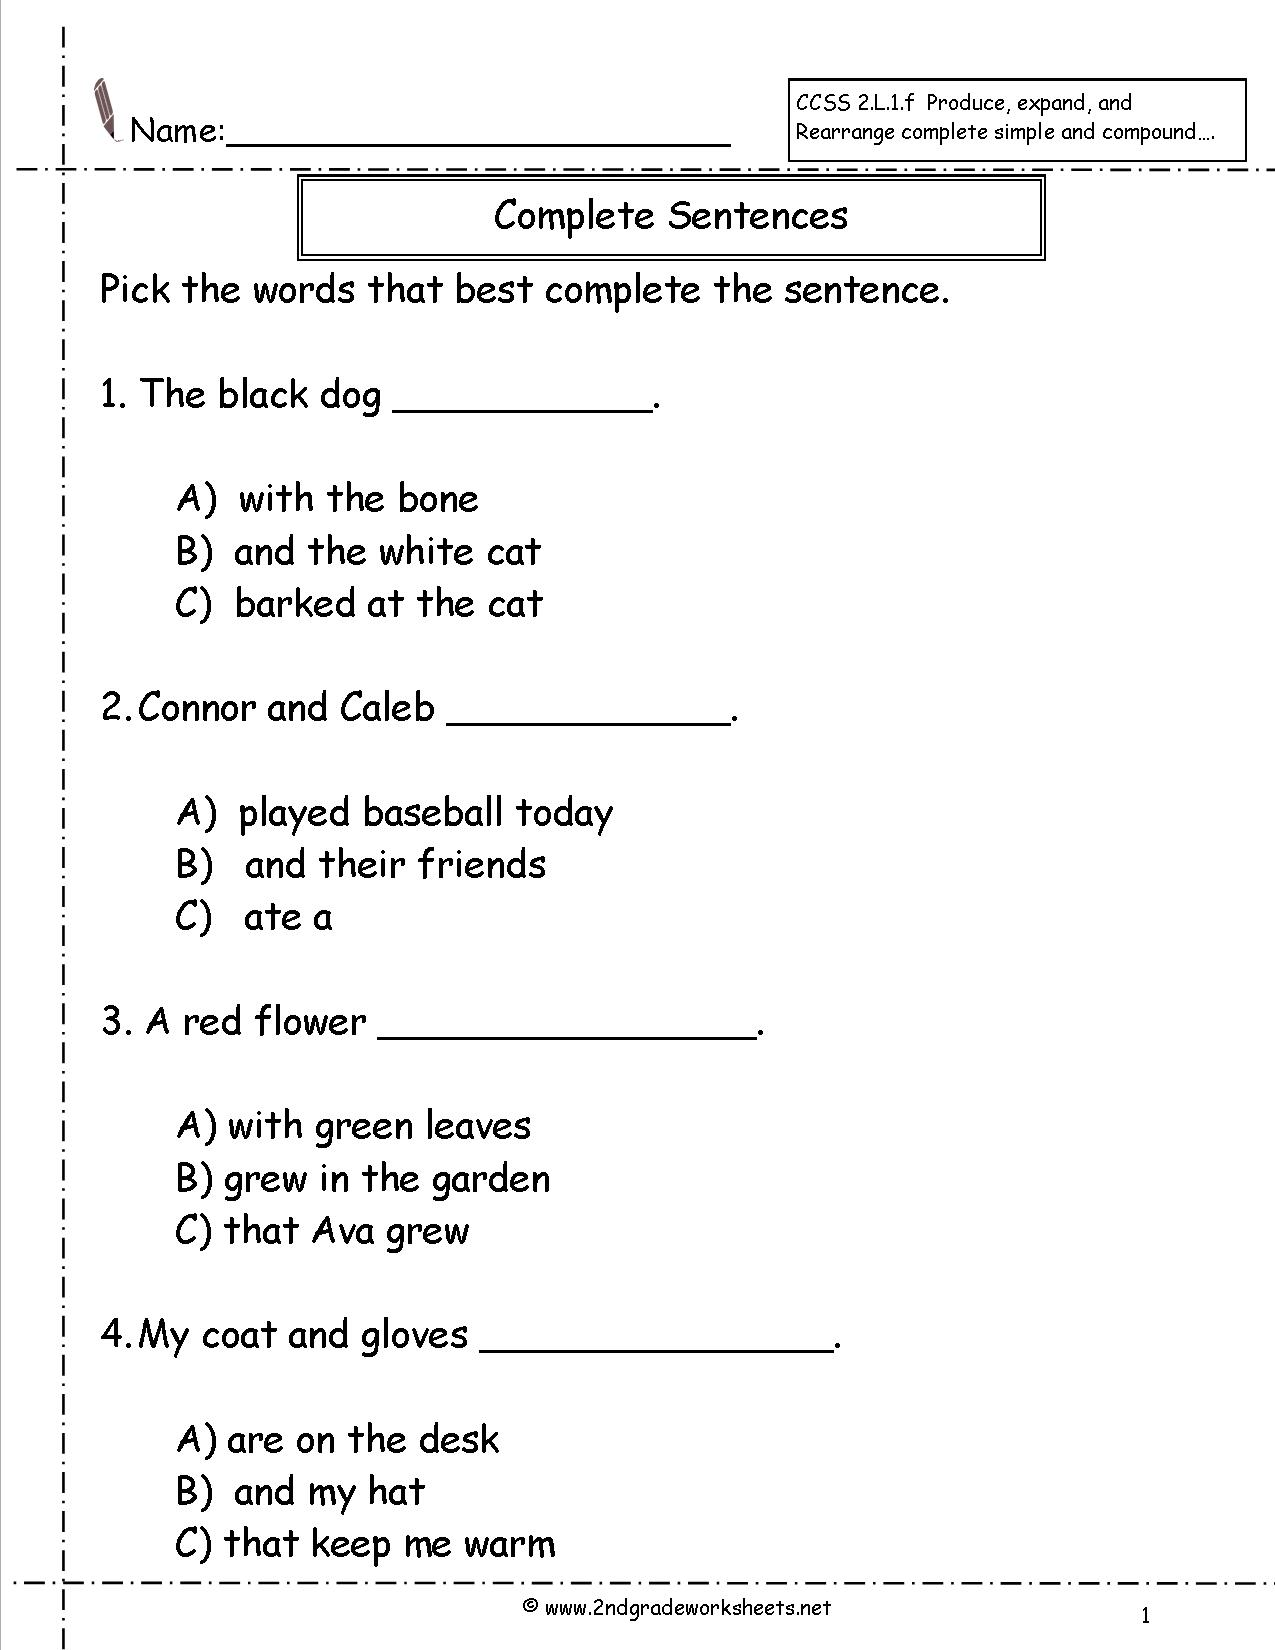 18 Best Images Of First Grade Sentence Writing Worksheet